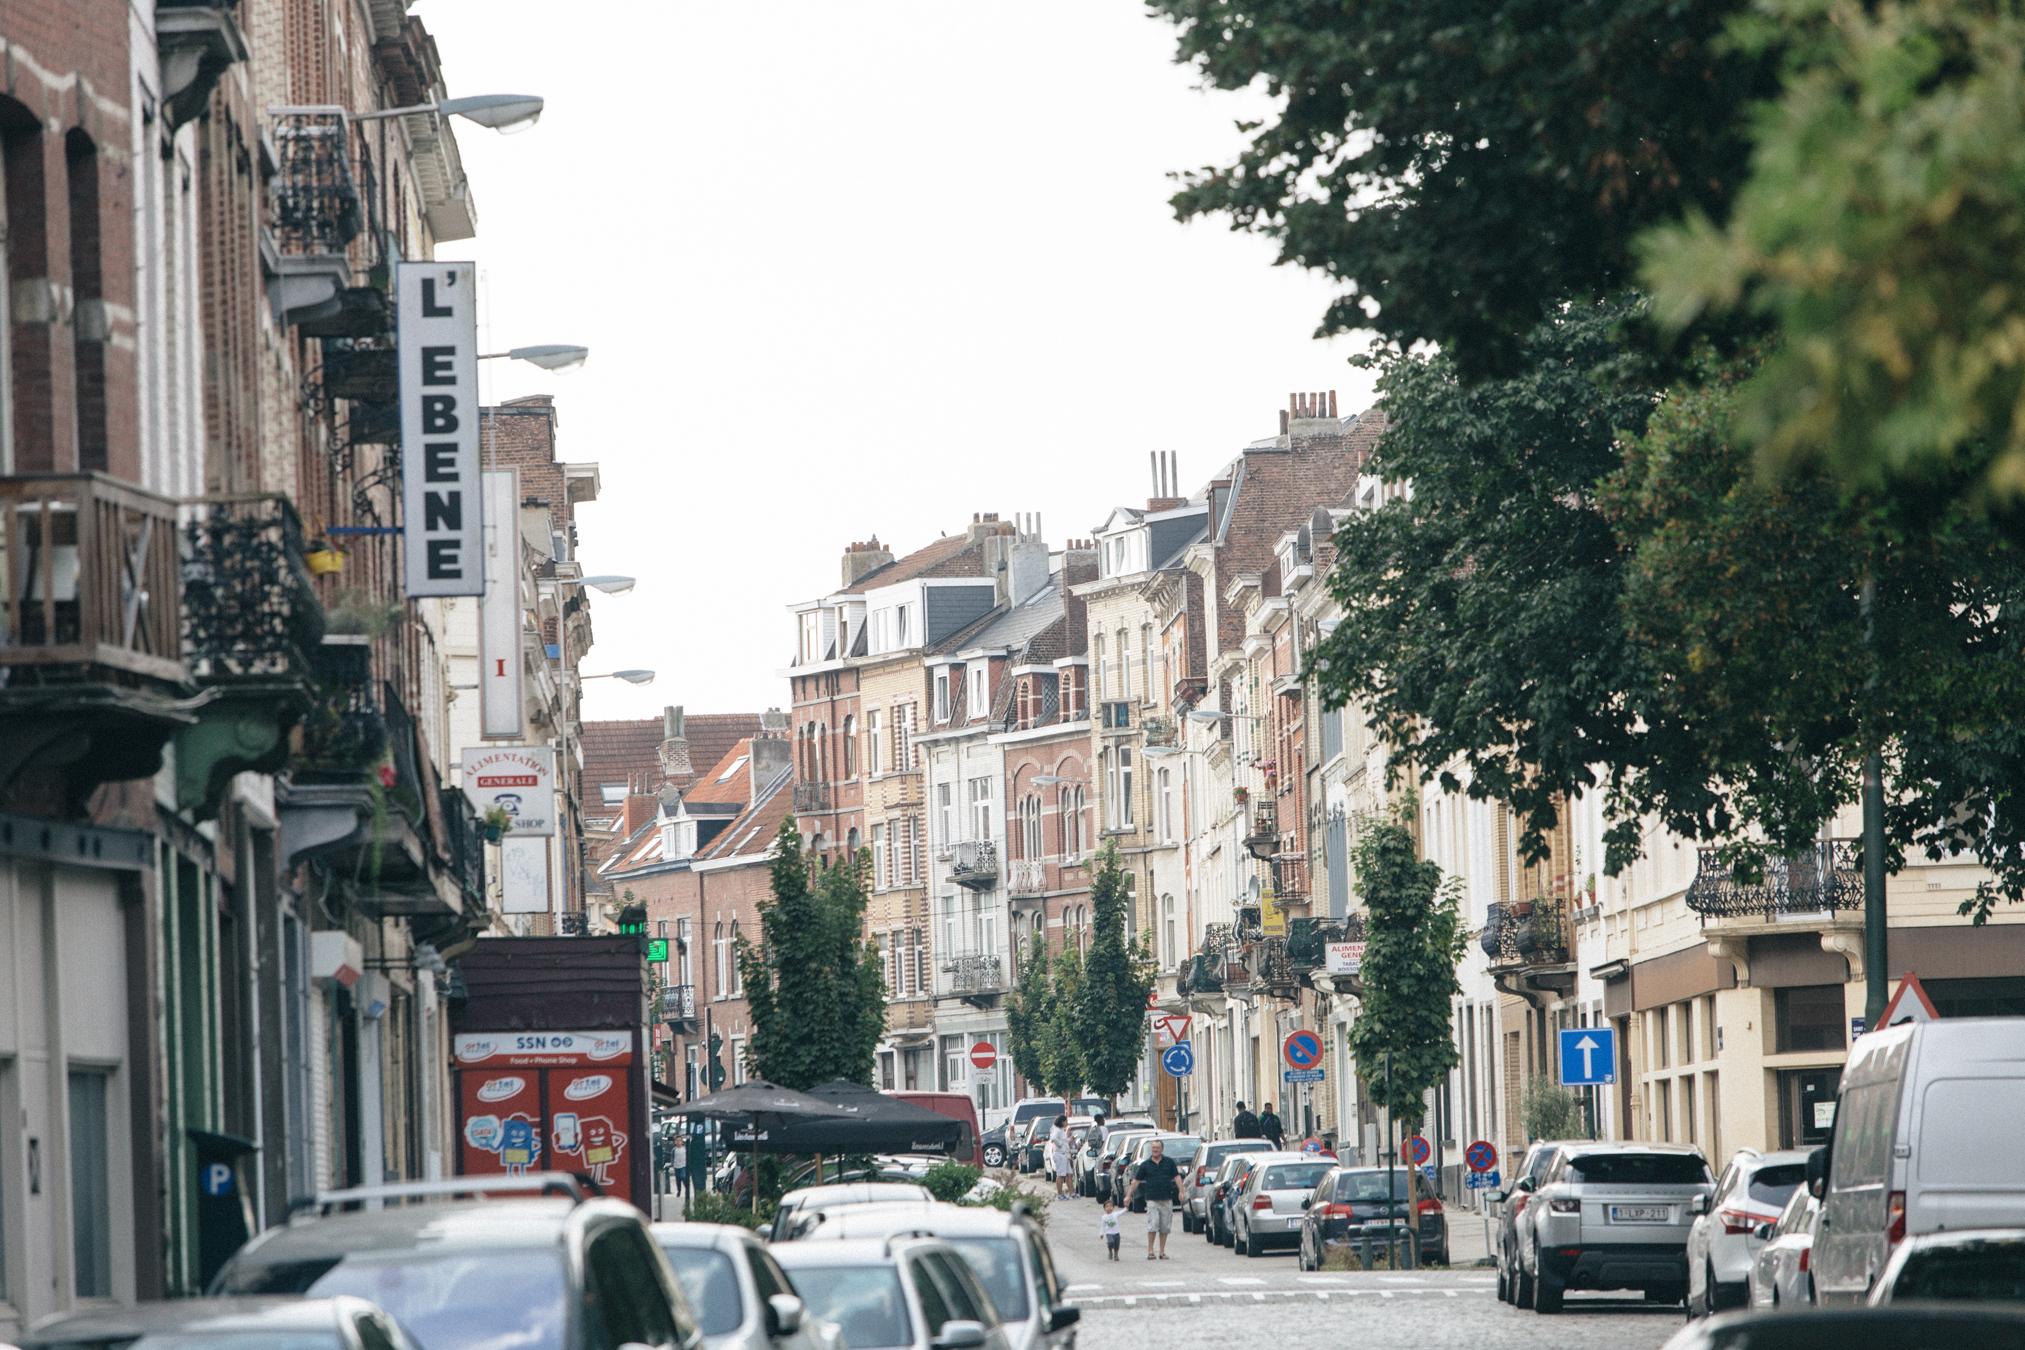 Bruxelas-19.jpg